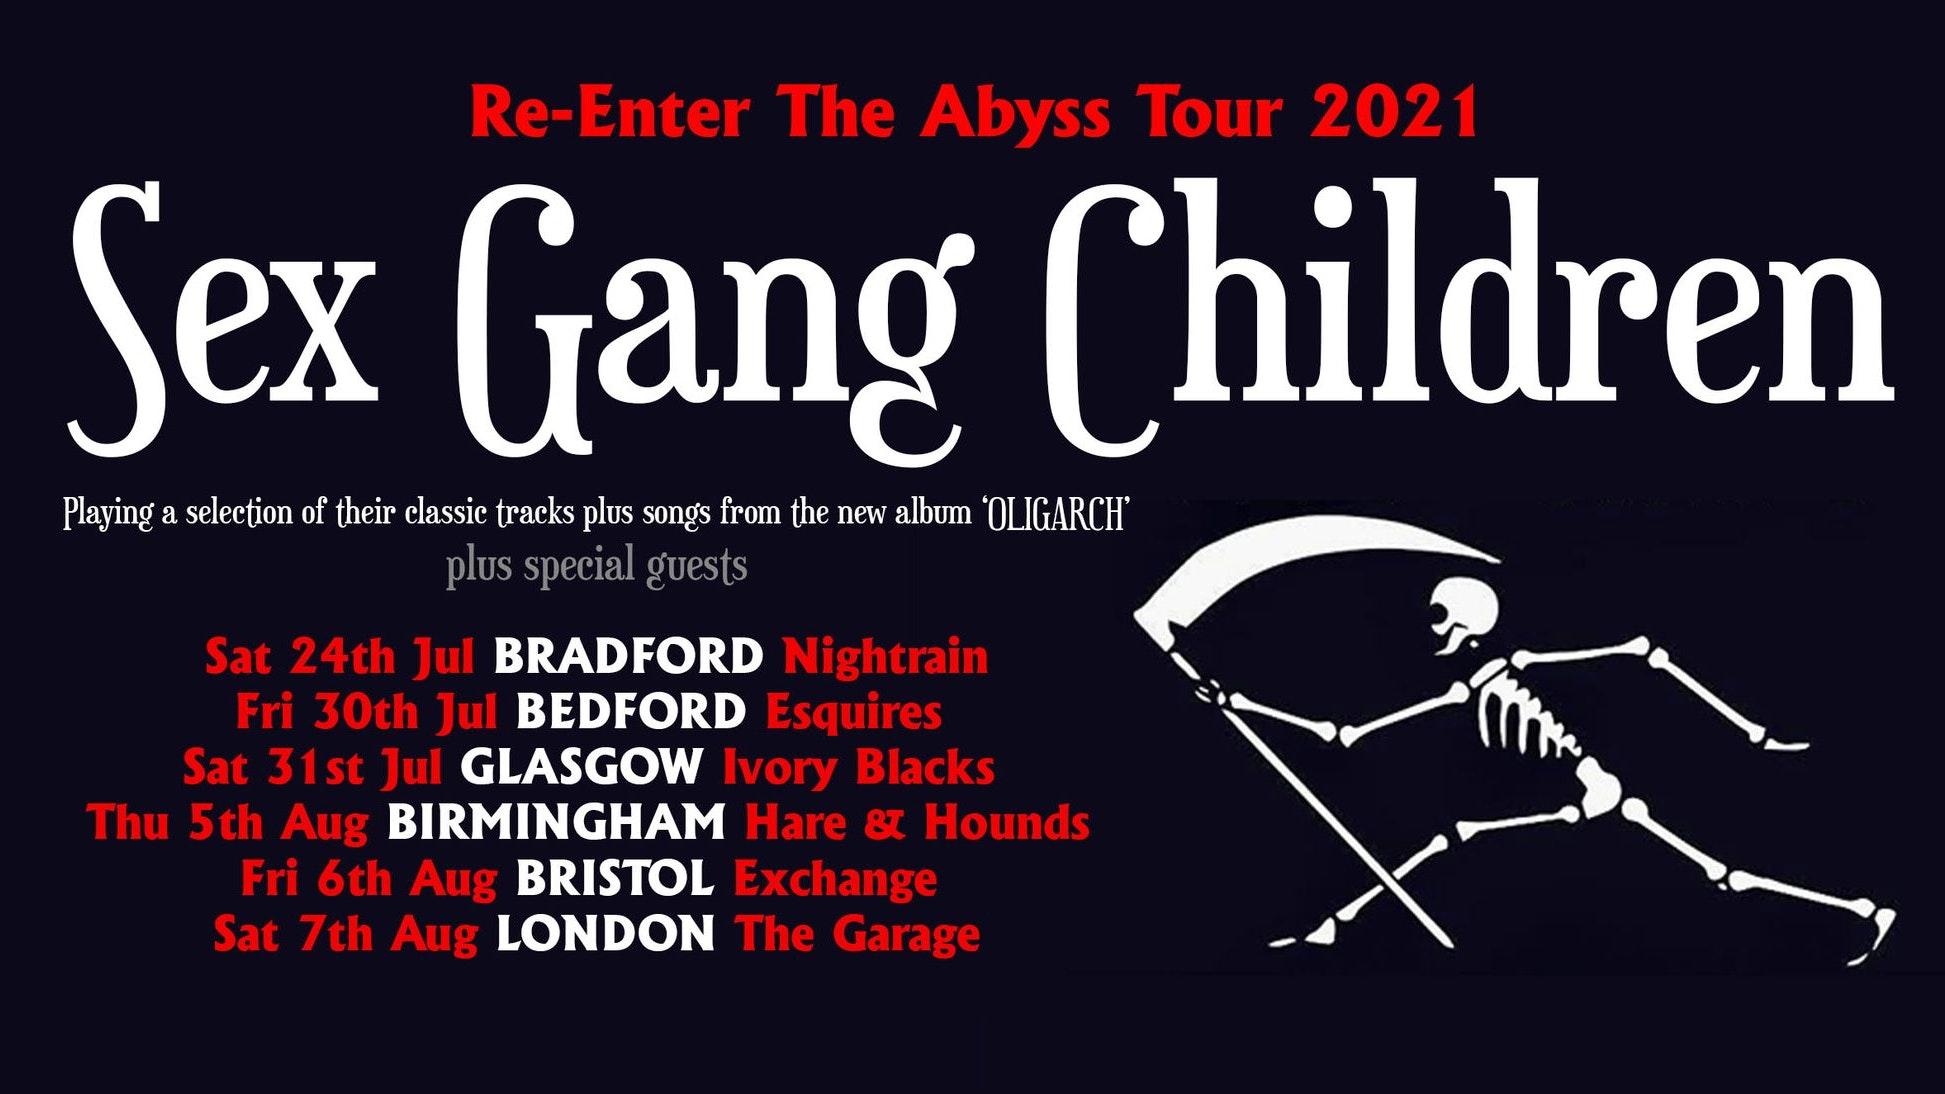 Sex Gang Children Re-Enter The Abyss Tour 2021 – Glasgow